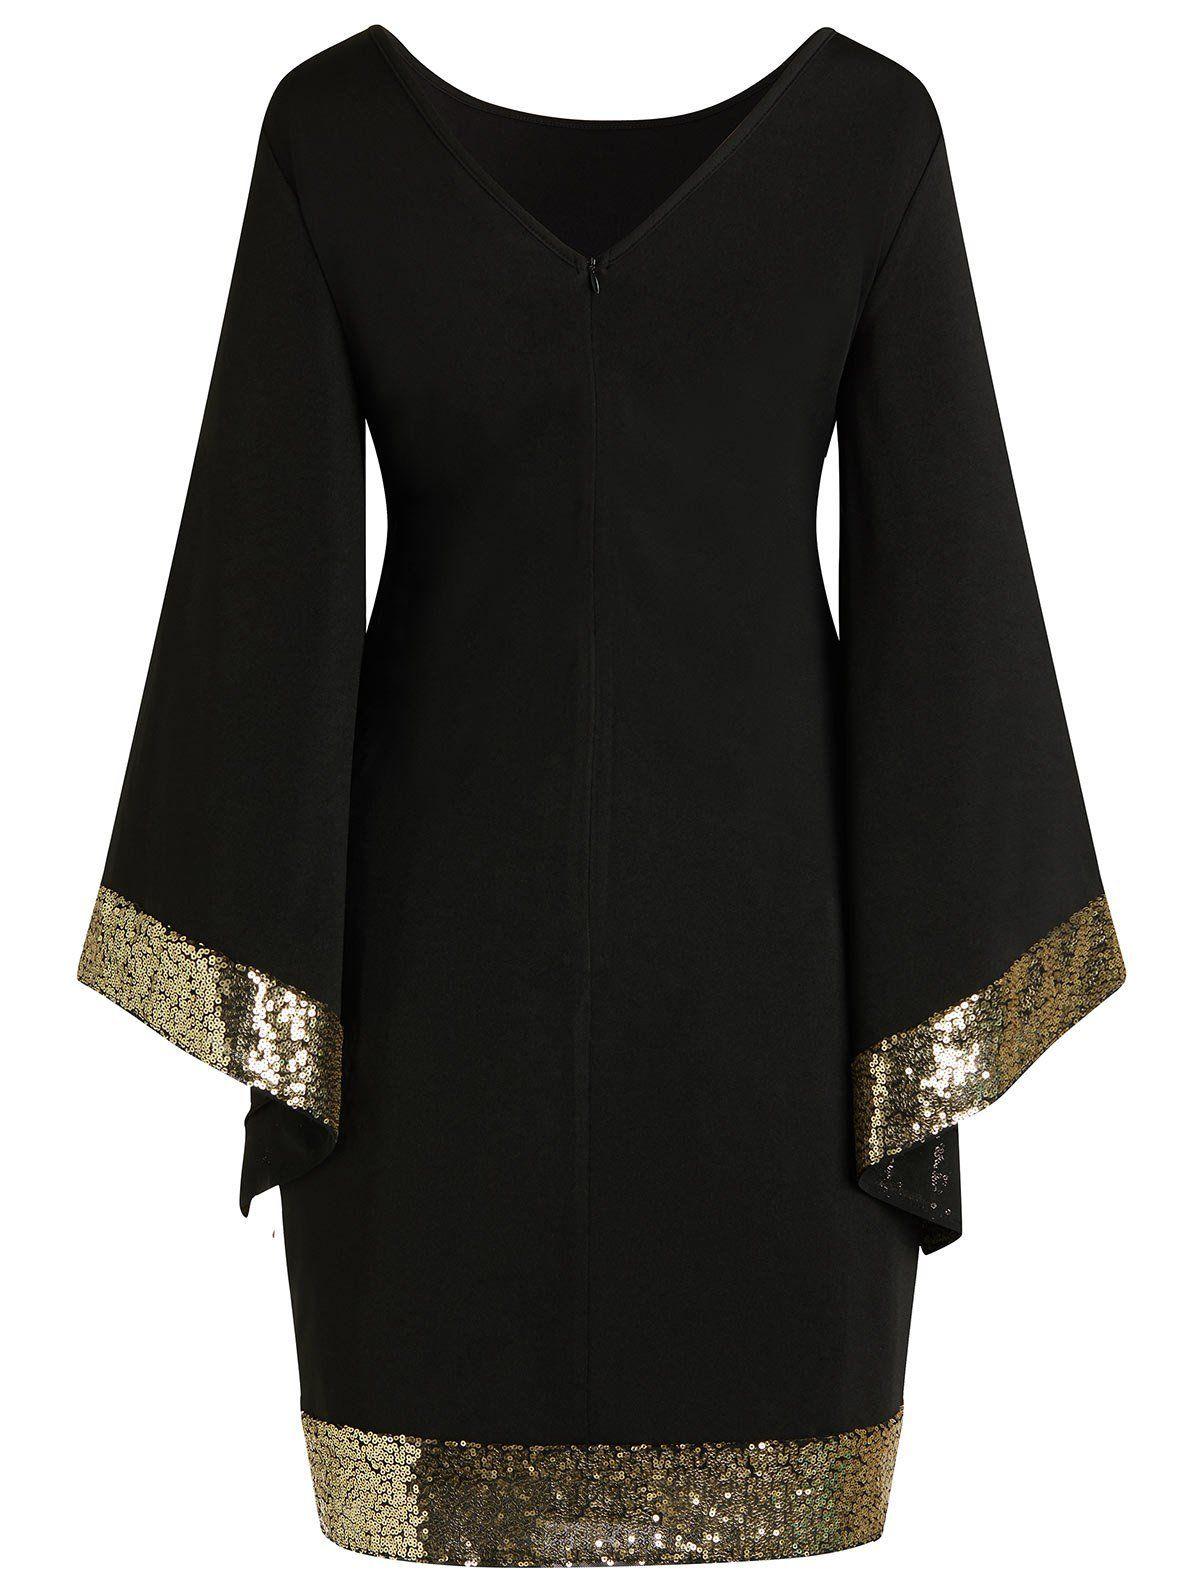 Gold Trim Black Dress Plus Size Work Dresses Dresses With Sleeves Flare Sleeve Dress